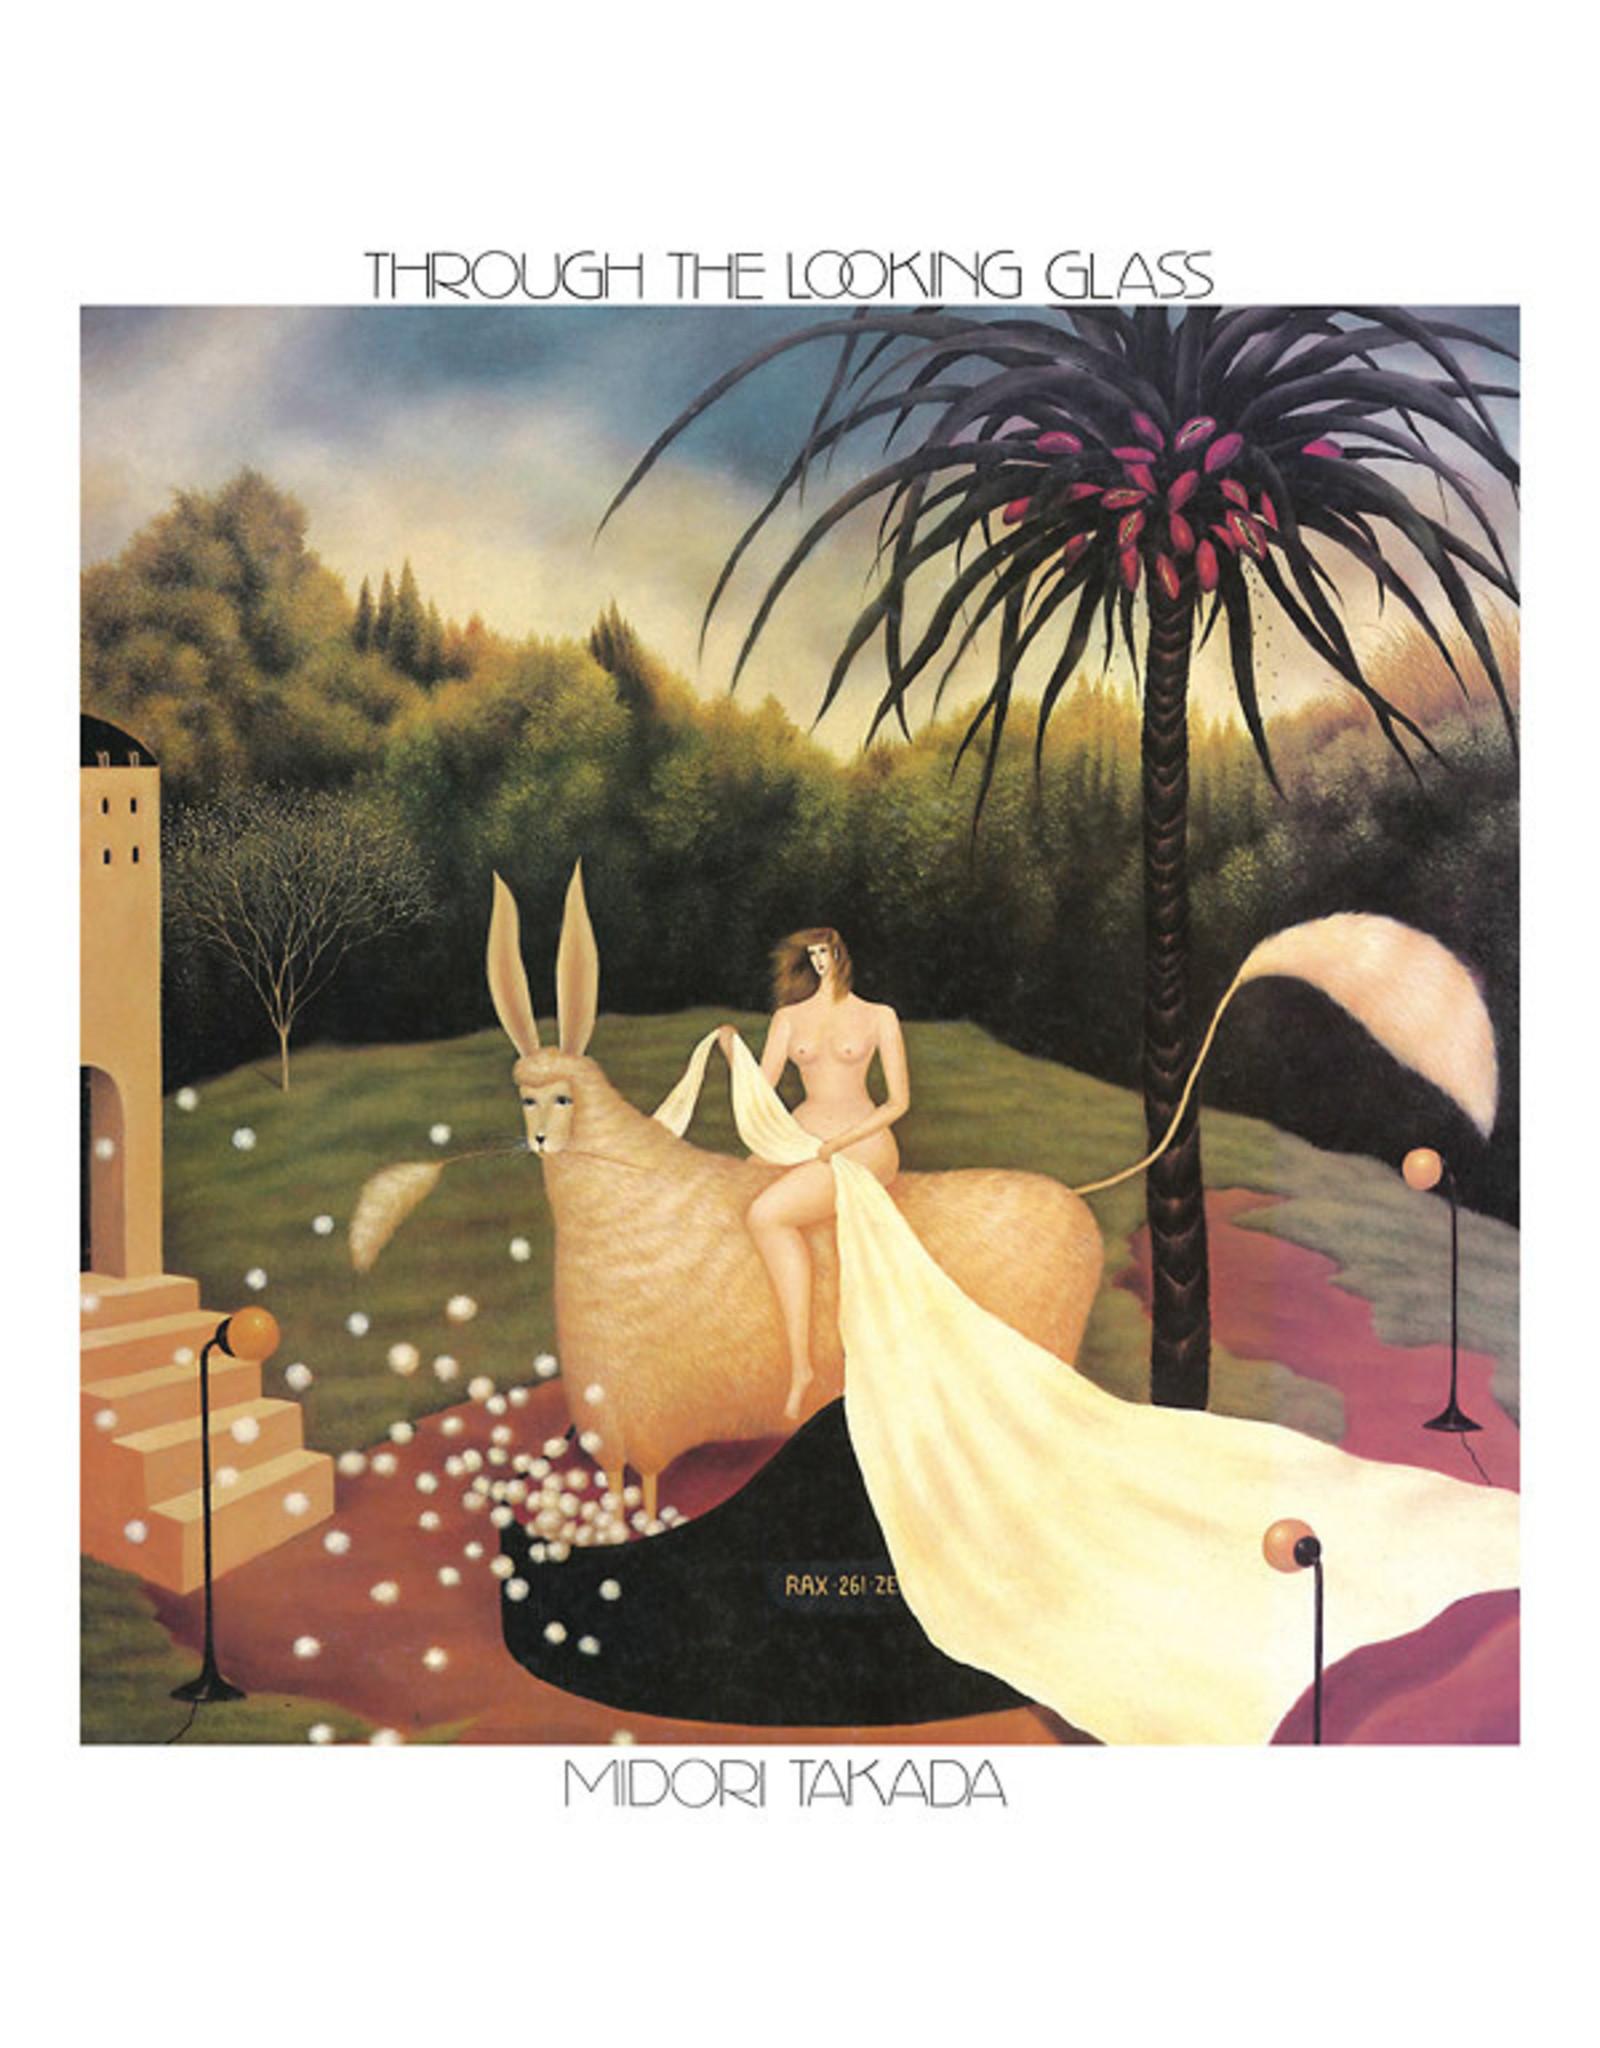 New Vinyl Midori Takada - Through The Looking Glass LP